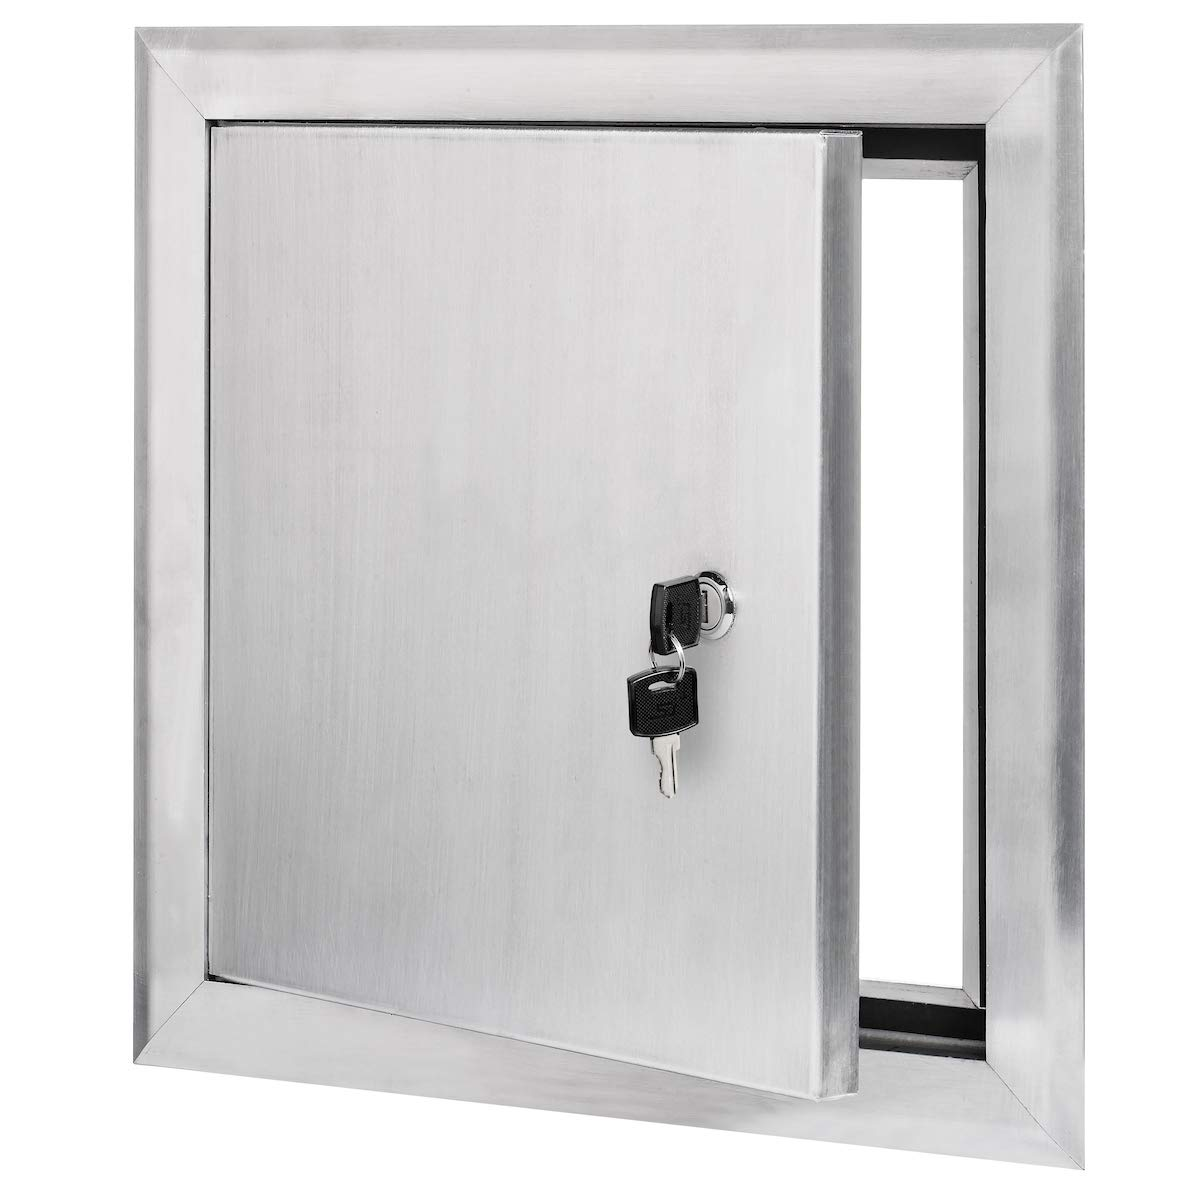 Premier 2400 Series Aluminum Universal Access Door 12 x 12 (Keyed Cylinder Latch)